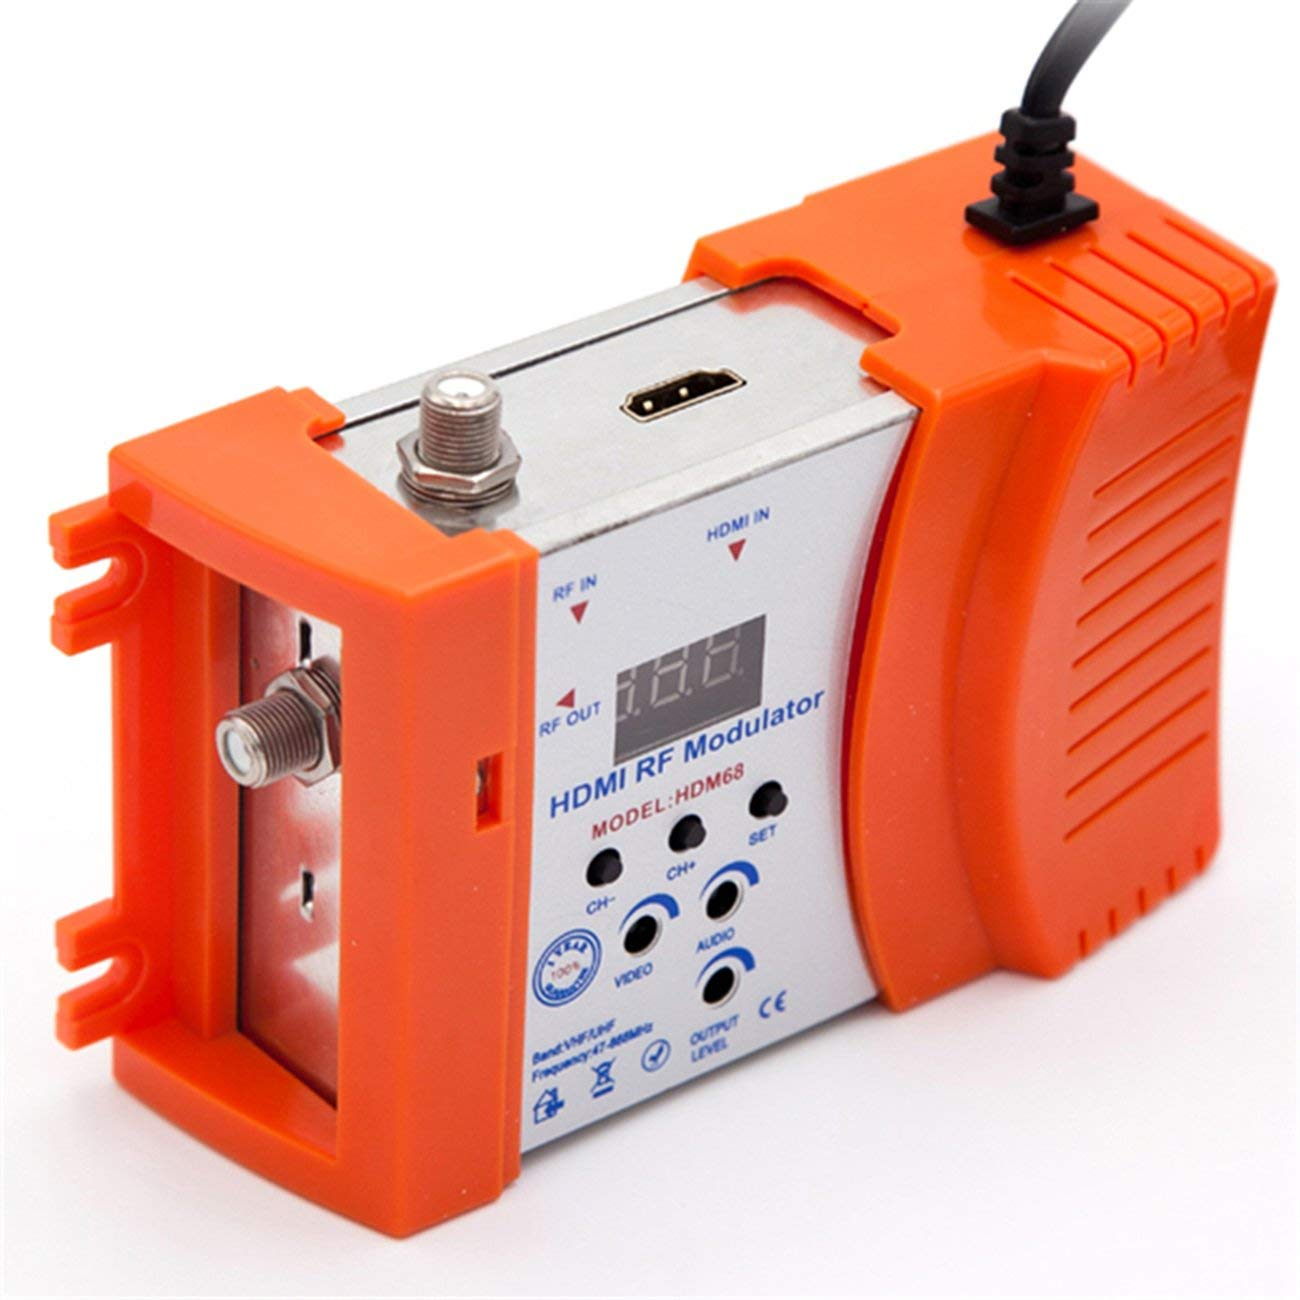 GreatWall Hdm68-modulator Digitaler Hf-hdmi-Modulator VHF Uhf-Frequenz Pal//Ntsc-Standard